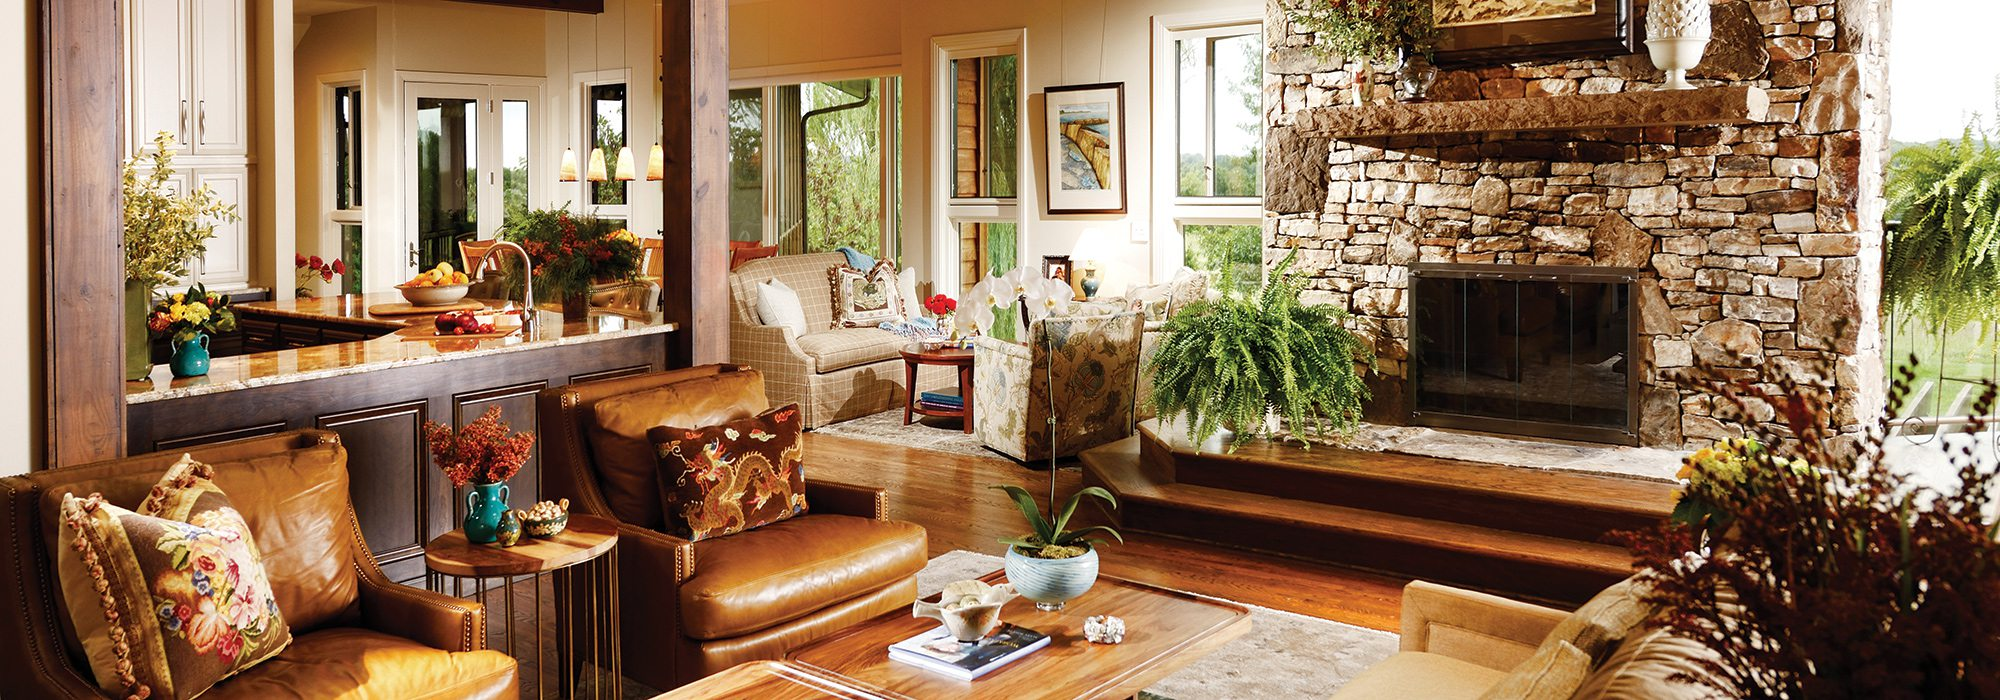 417 Home Design Awards 2015 Whole Home Winner - Living Room